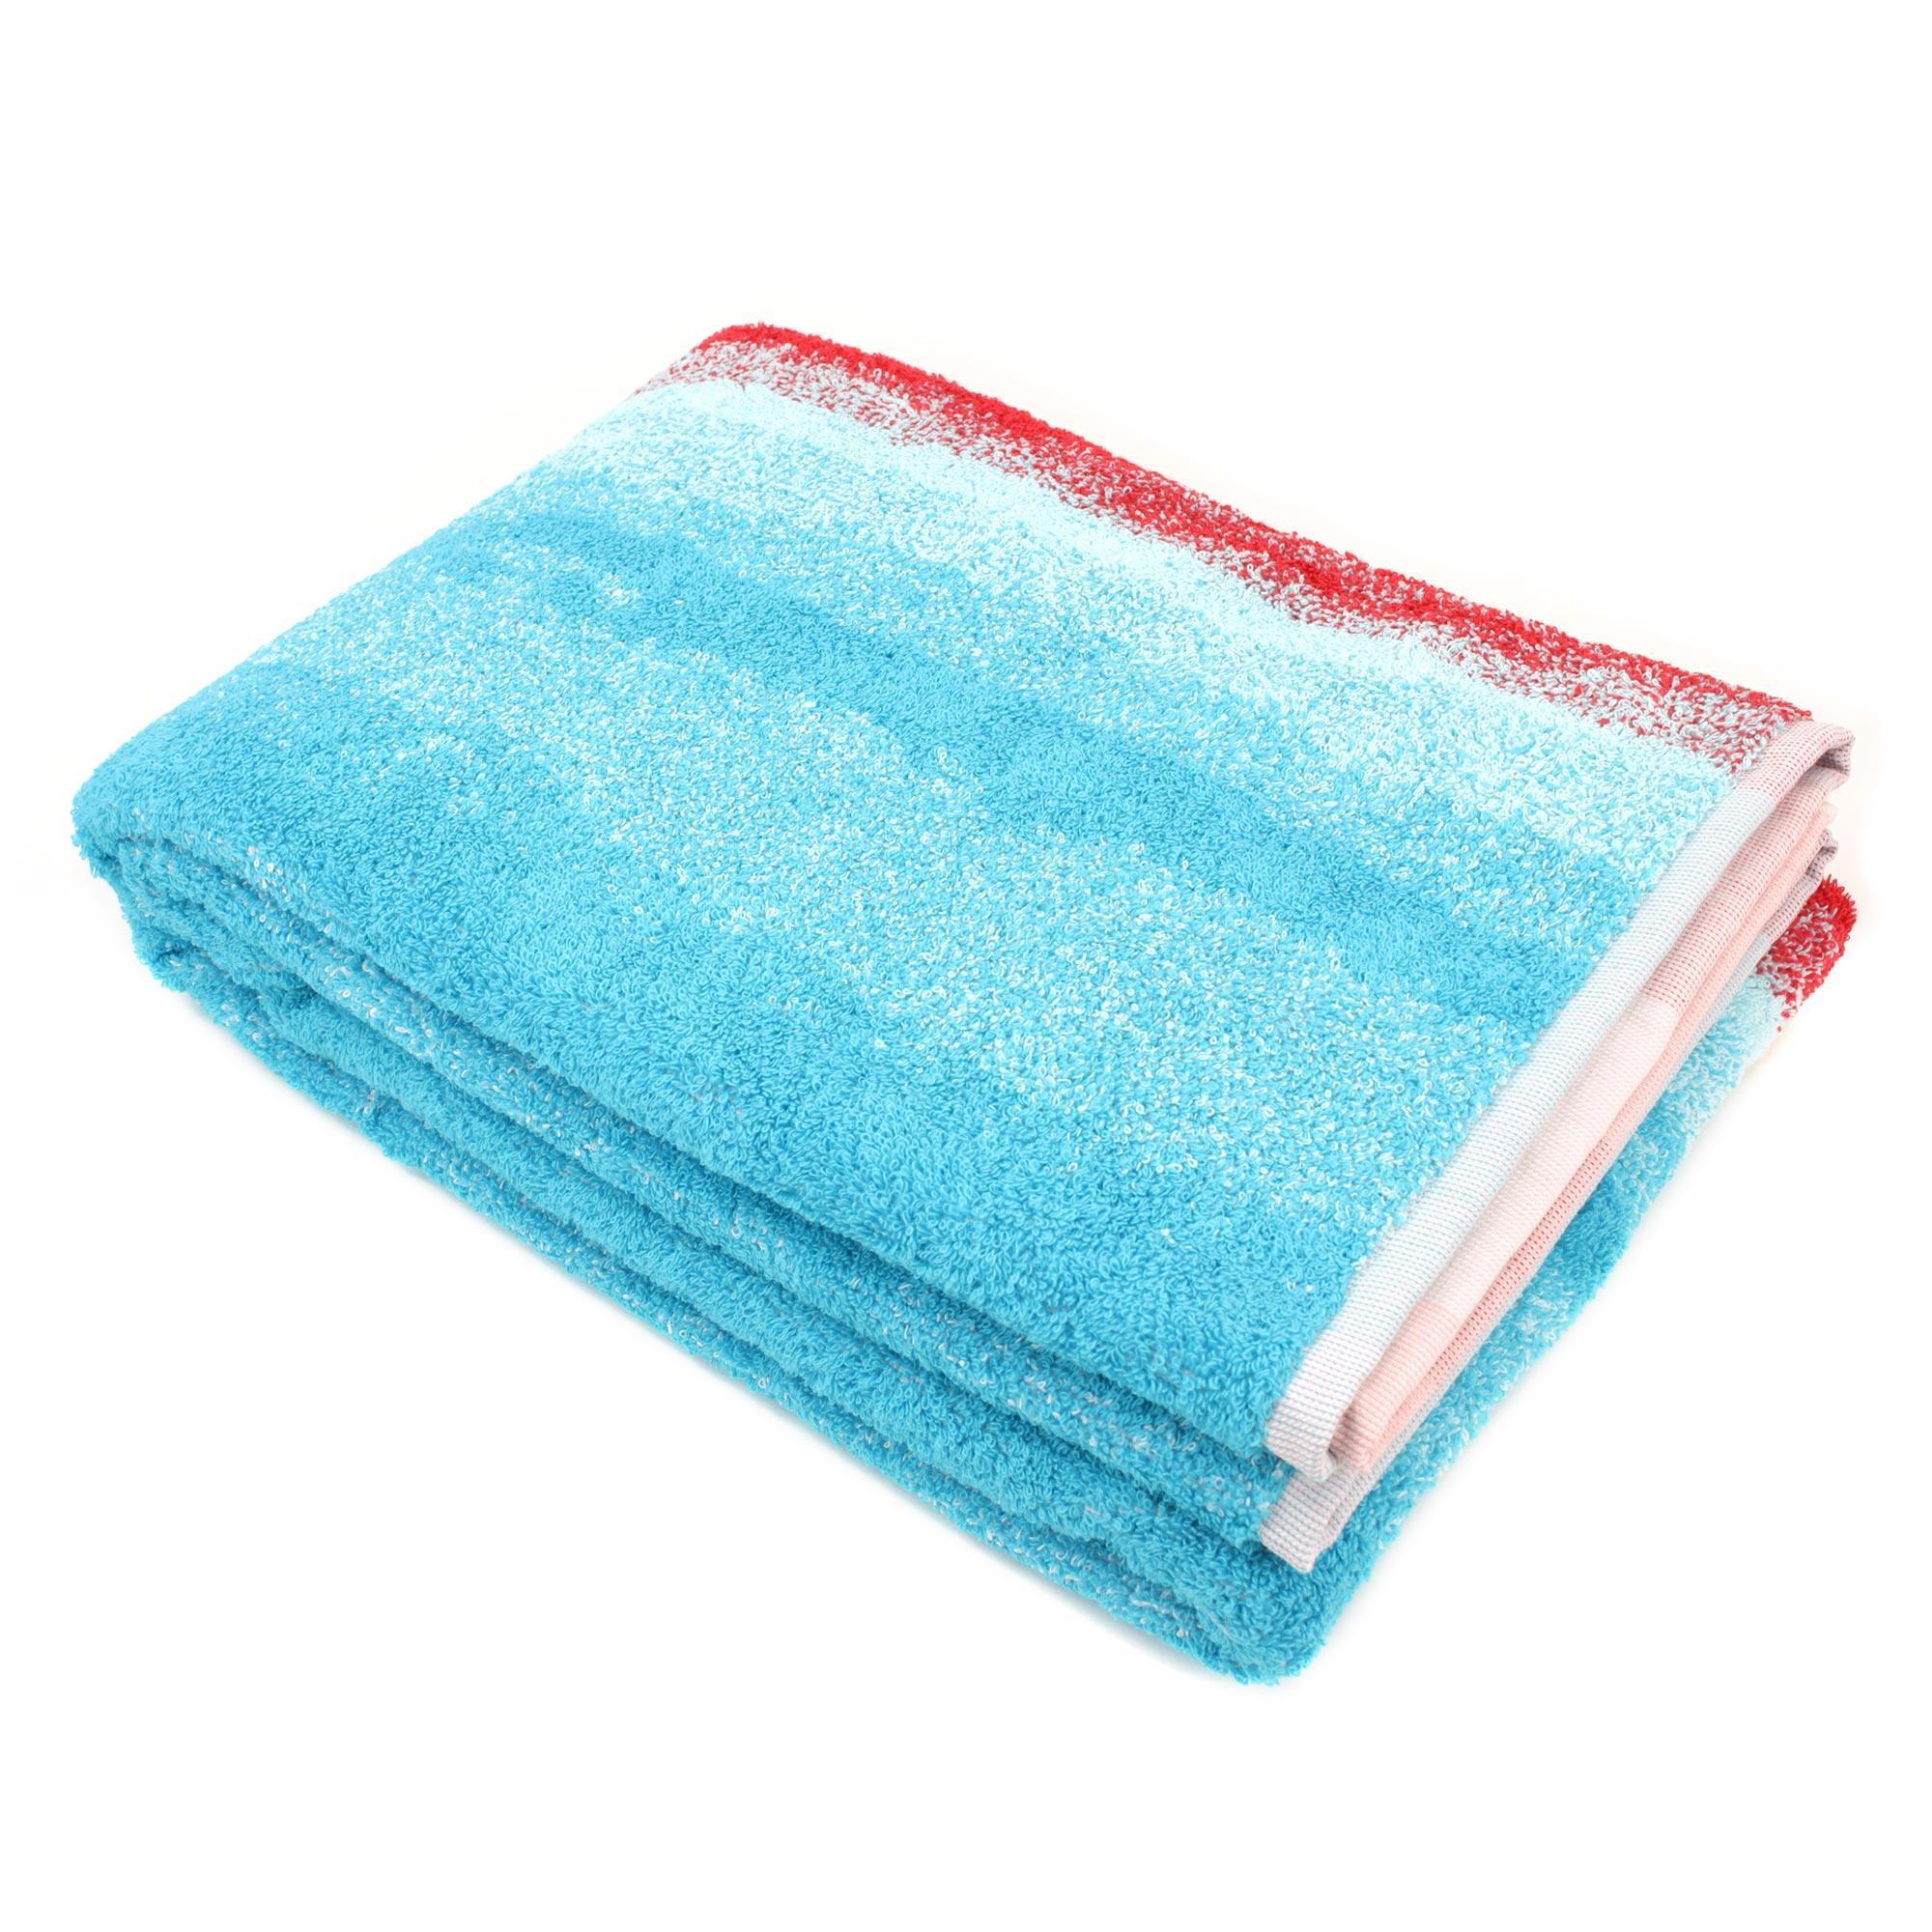 drap de bain 100x150 100 coton 500g m2 kodac rayures rouge bleu ebay. Black Bedroom Furniture Sets. Home Design Ideas